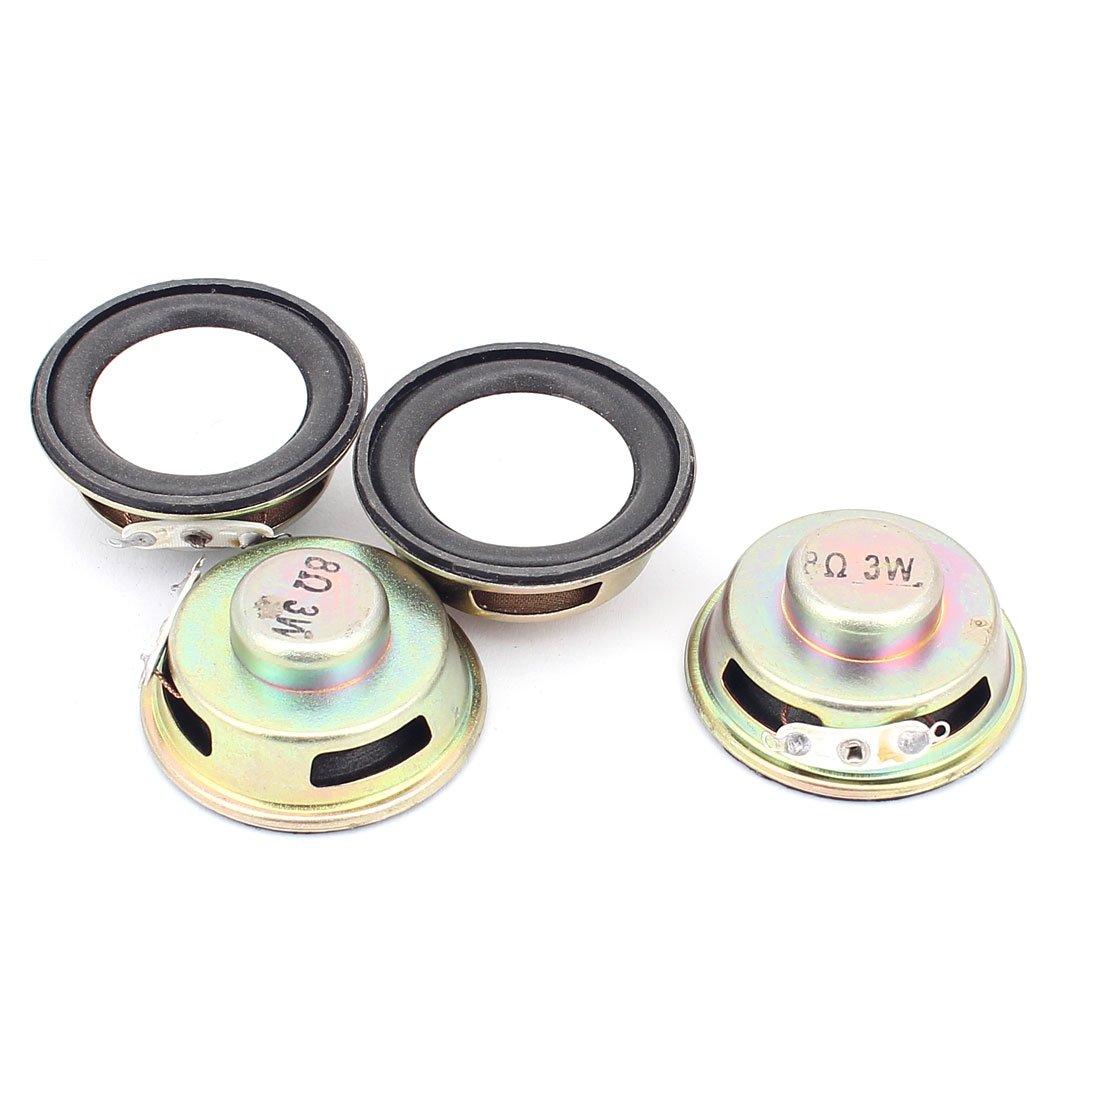 uxcell 4 Pcs 40mm 8Ohm 3W External Magnetic Speaker Loudspeaker Gold Tone